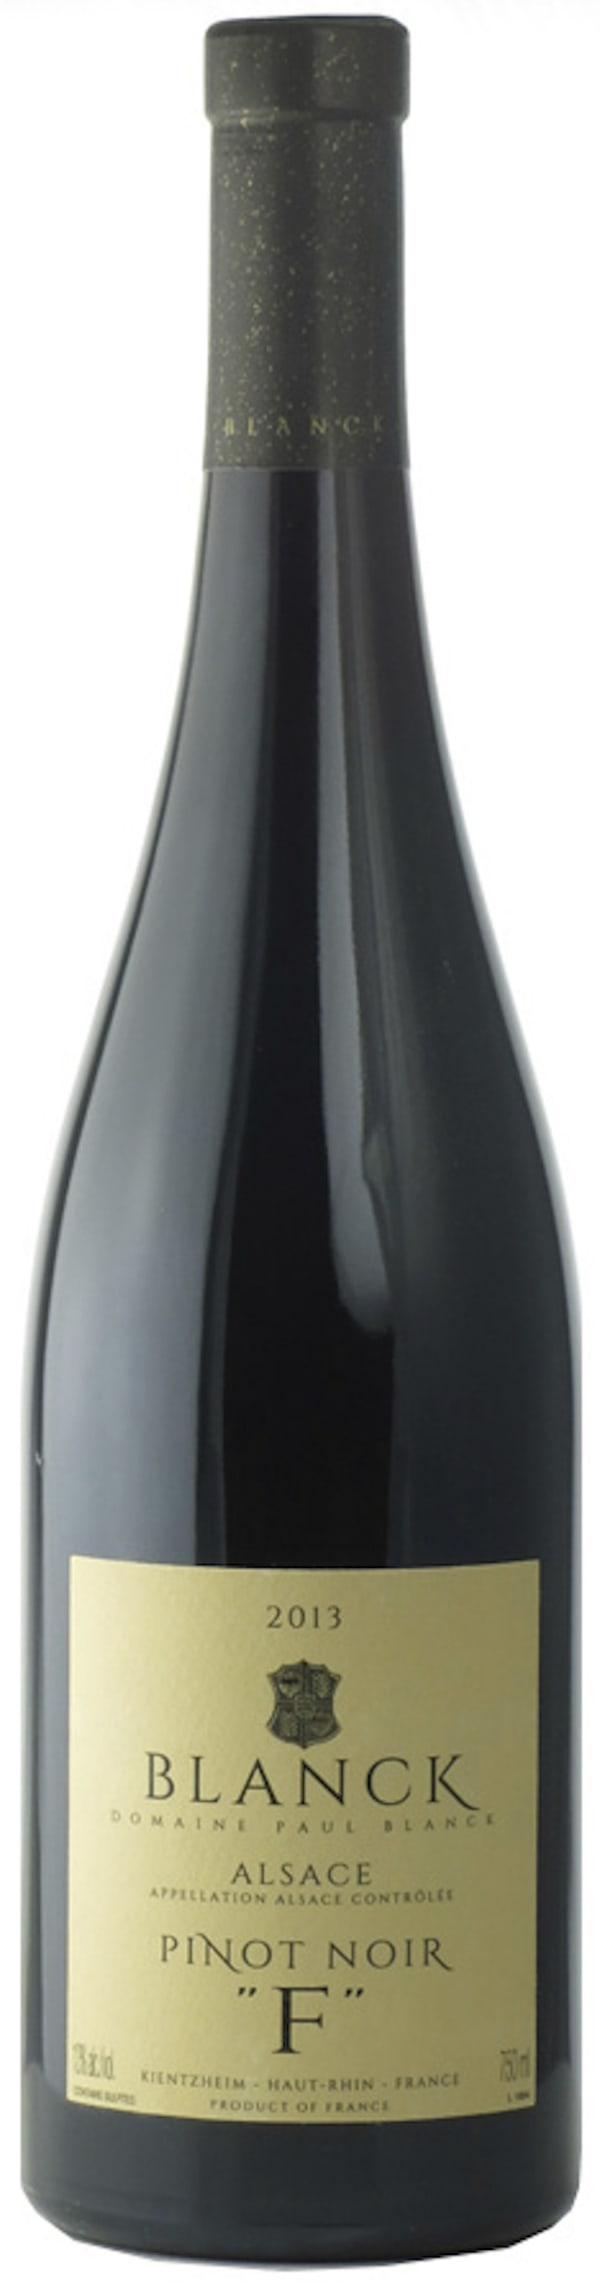 Paul Blanck Pinot Noir F 2013